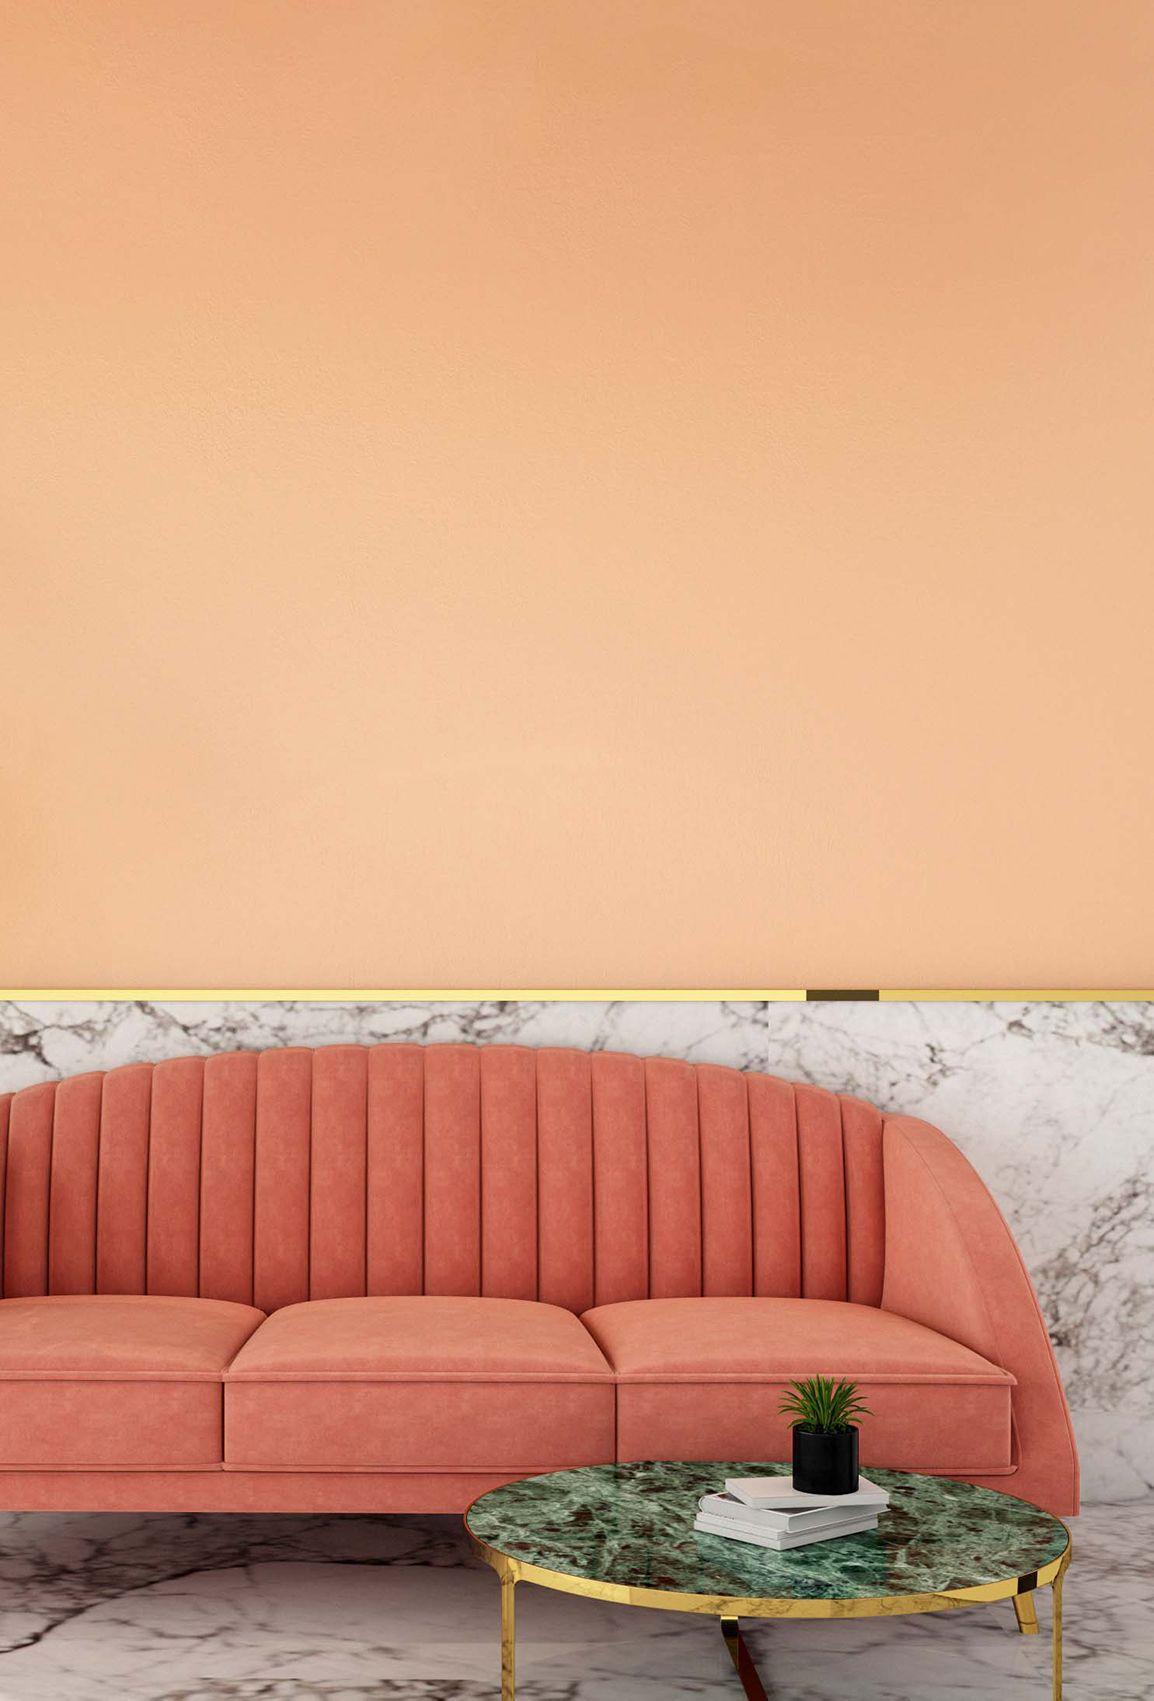 Sorbet C2 528 Orange Rooms Peach Rooms Orange Paint Colors #peach #color #living #room